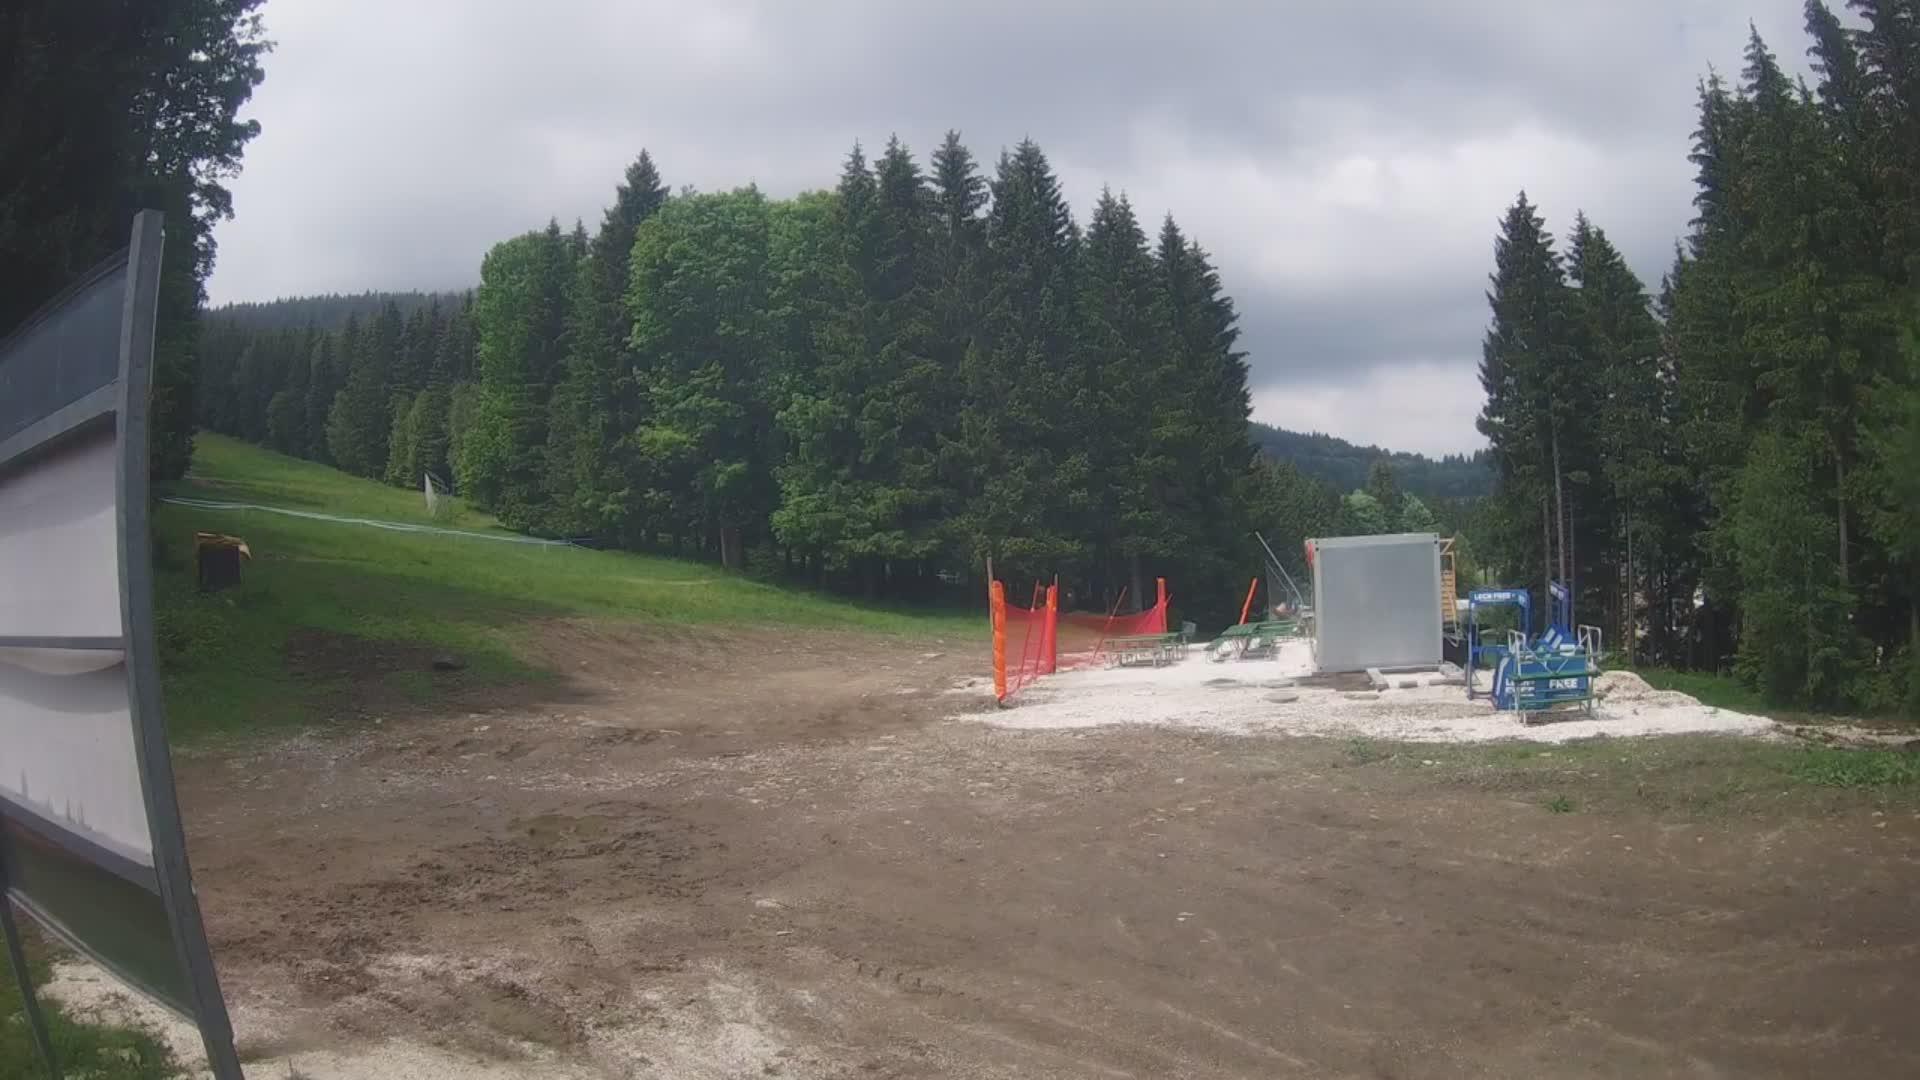 Webcam Skigebiet Czarna Gora cam 6 - Glatzer Schneegebirge